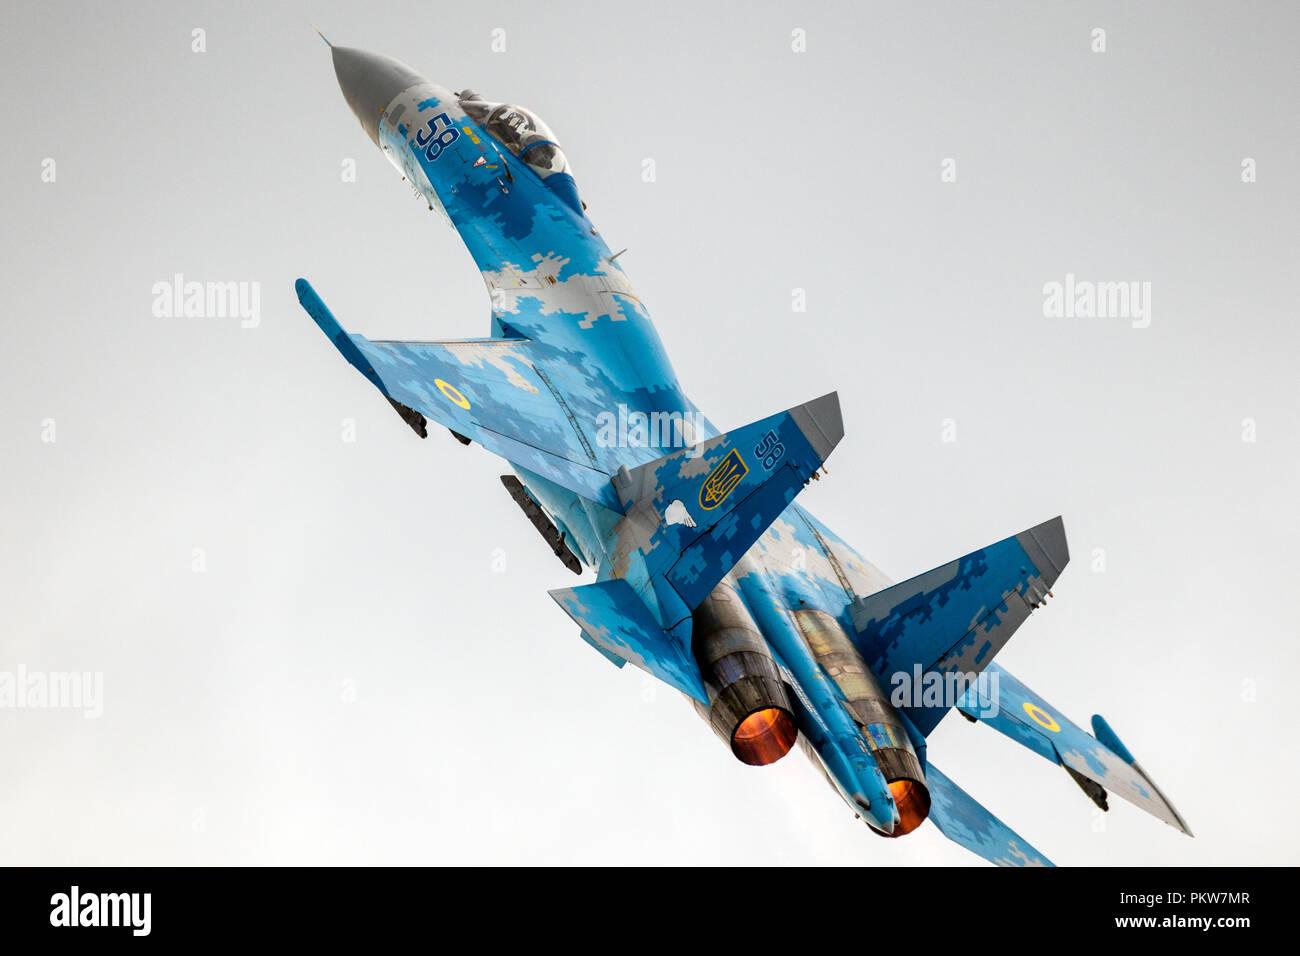 KLEINE BROGEL, BELGIUM - SEP 8, 2018: Ukrainian Air Force Sukhoi Su-27 Flanker fighter jet take off from Kleine-Brogel Airbase. - Stock Image